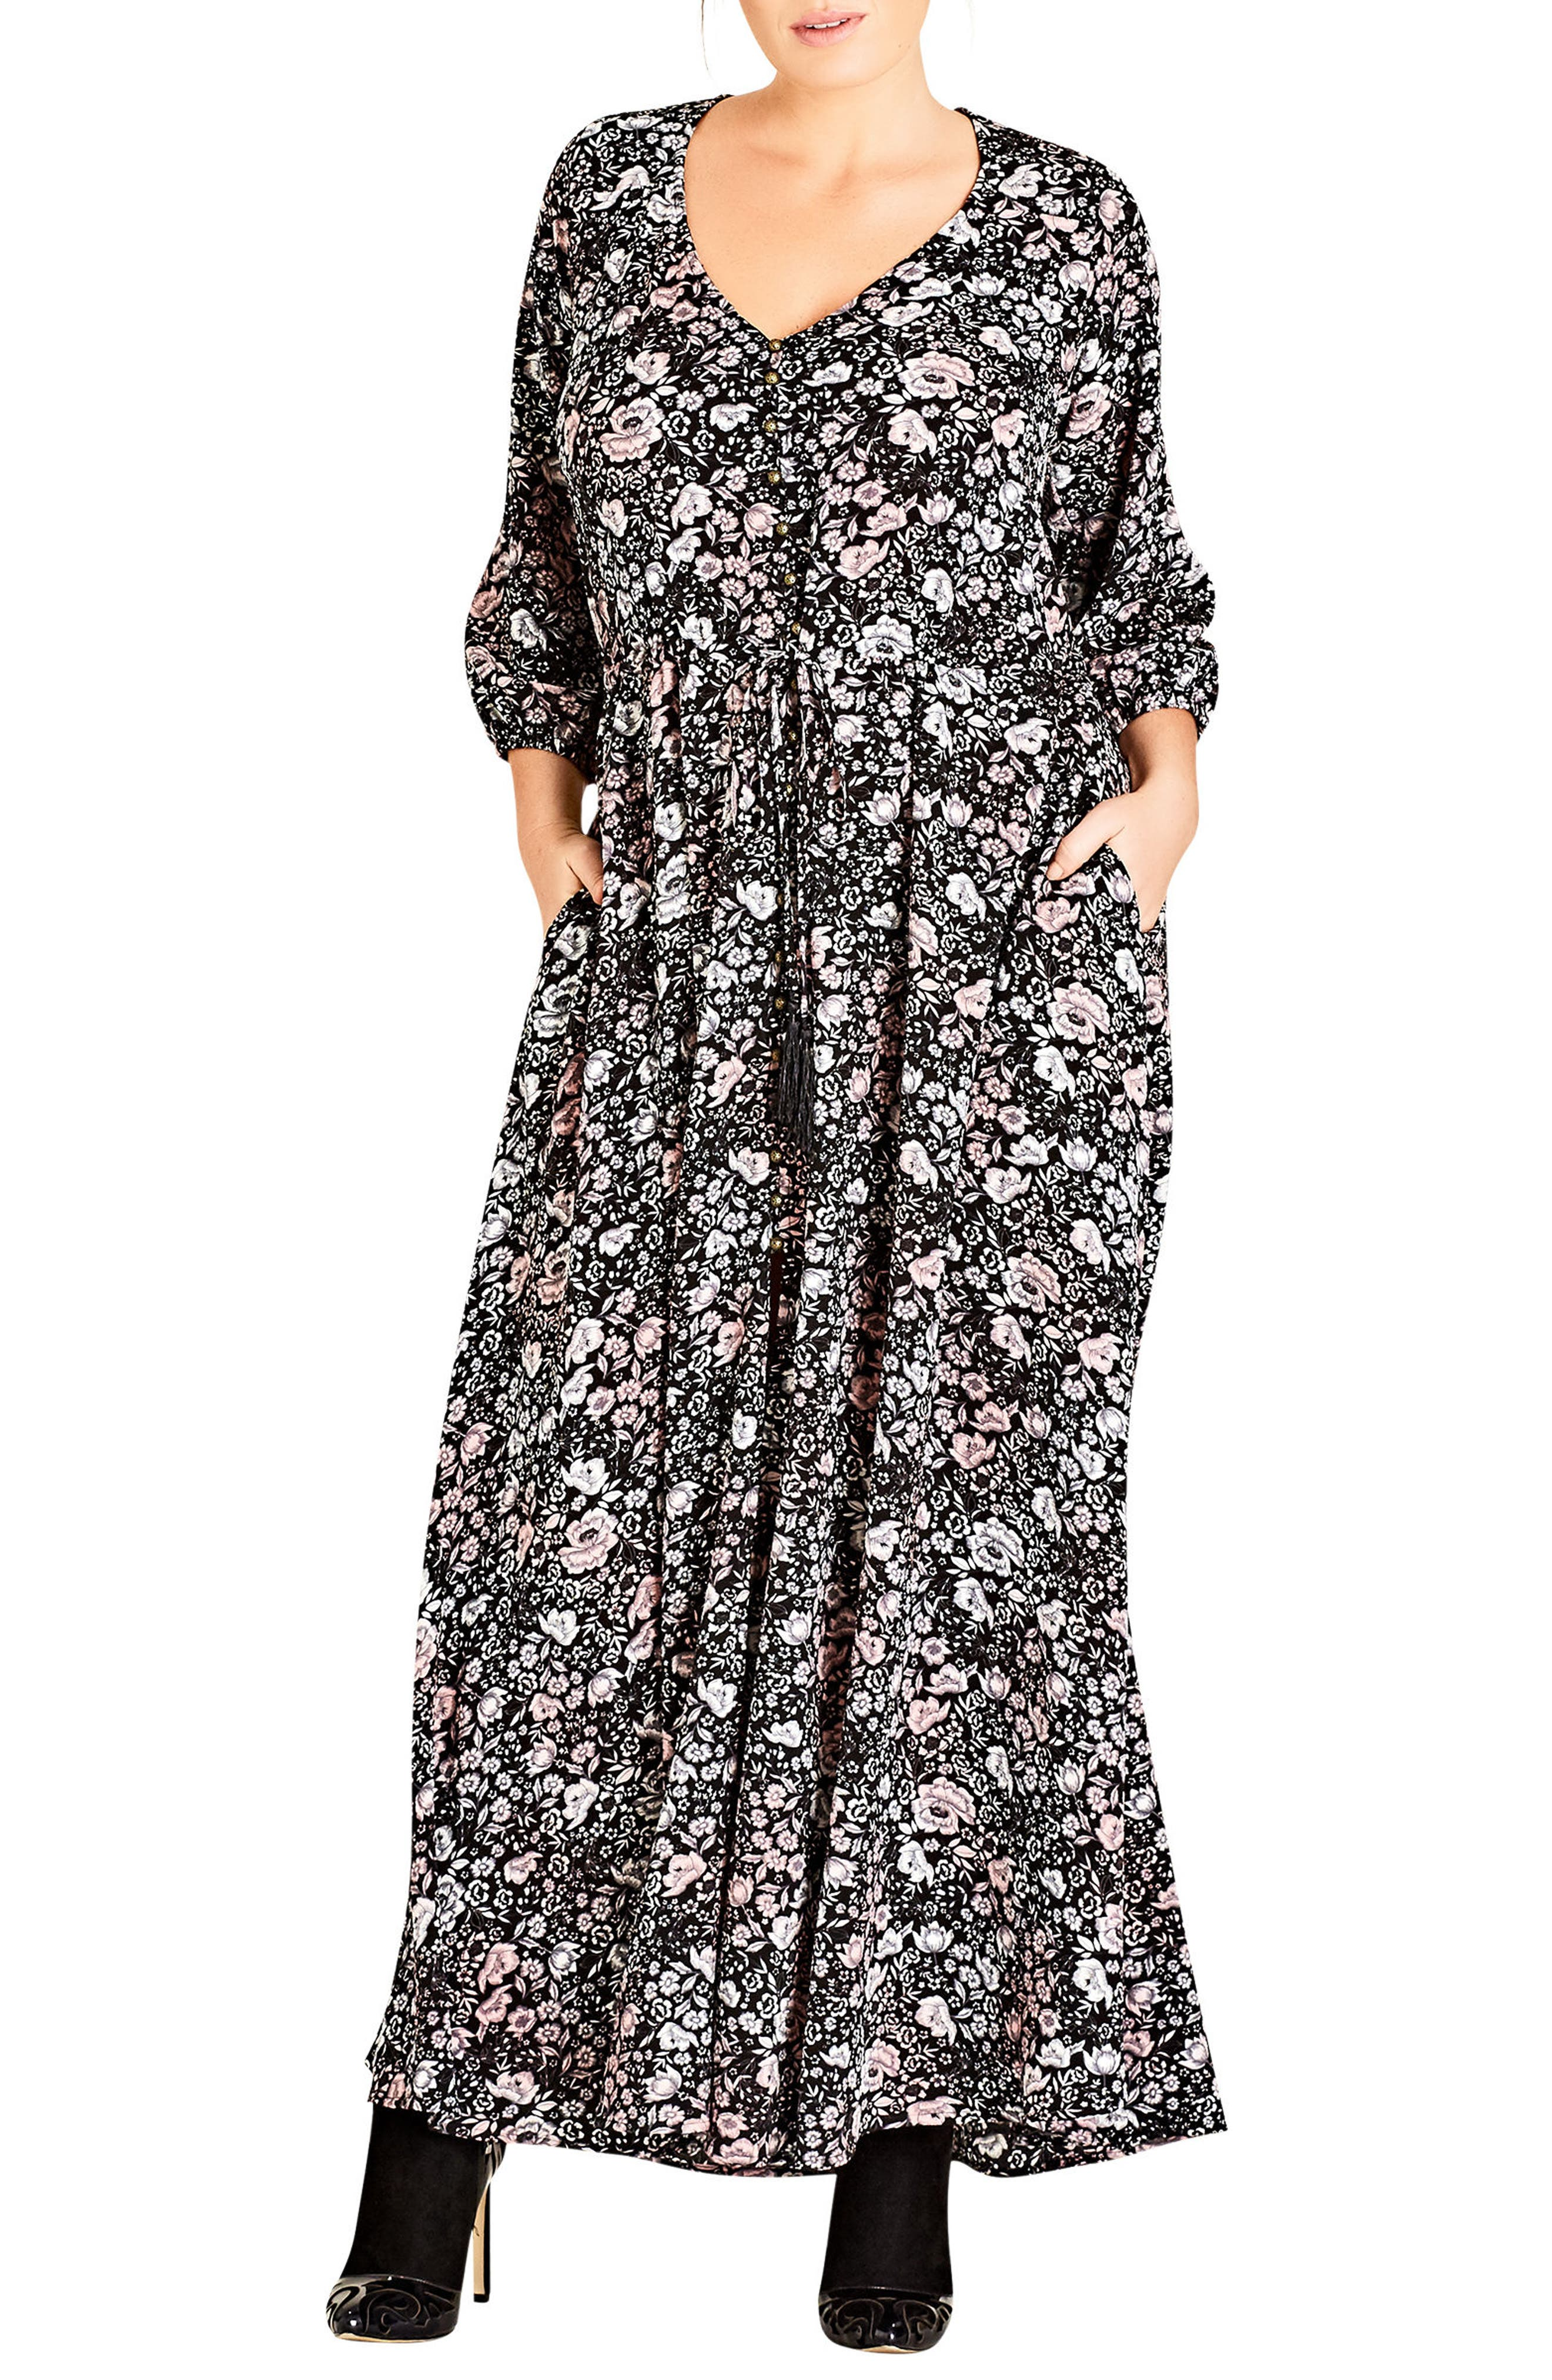 Etched Floral Maxi Dress,                             Main thumbnail 1, color,